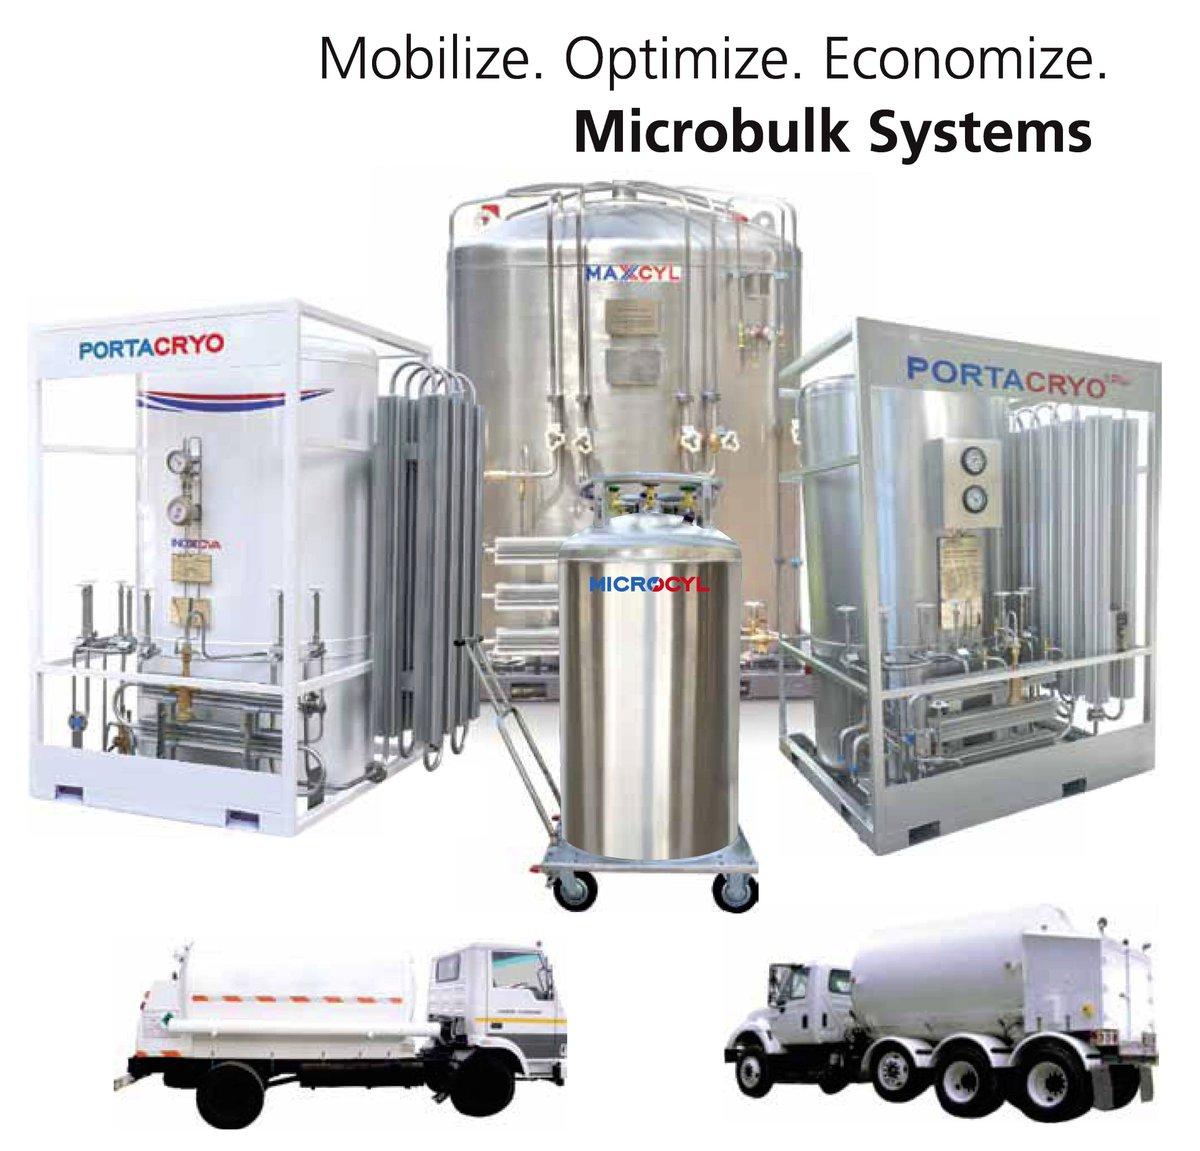 inoxcva on twitter inoxcva microbulk storage and delivery units